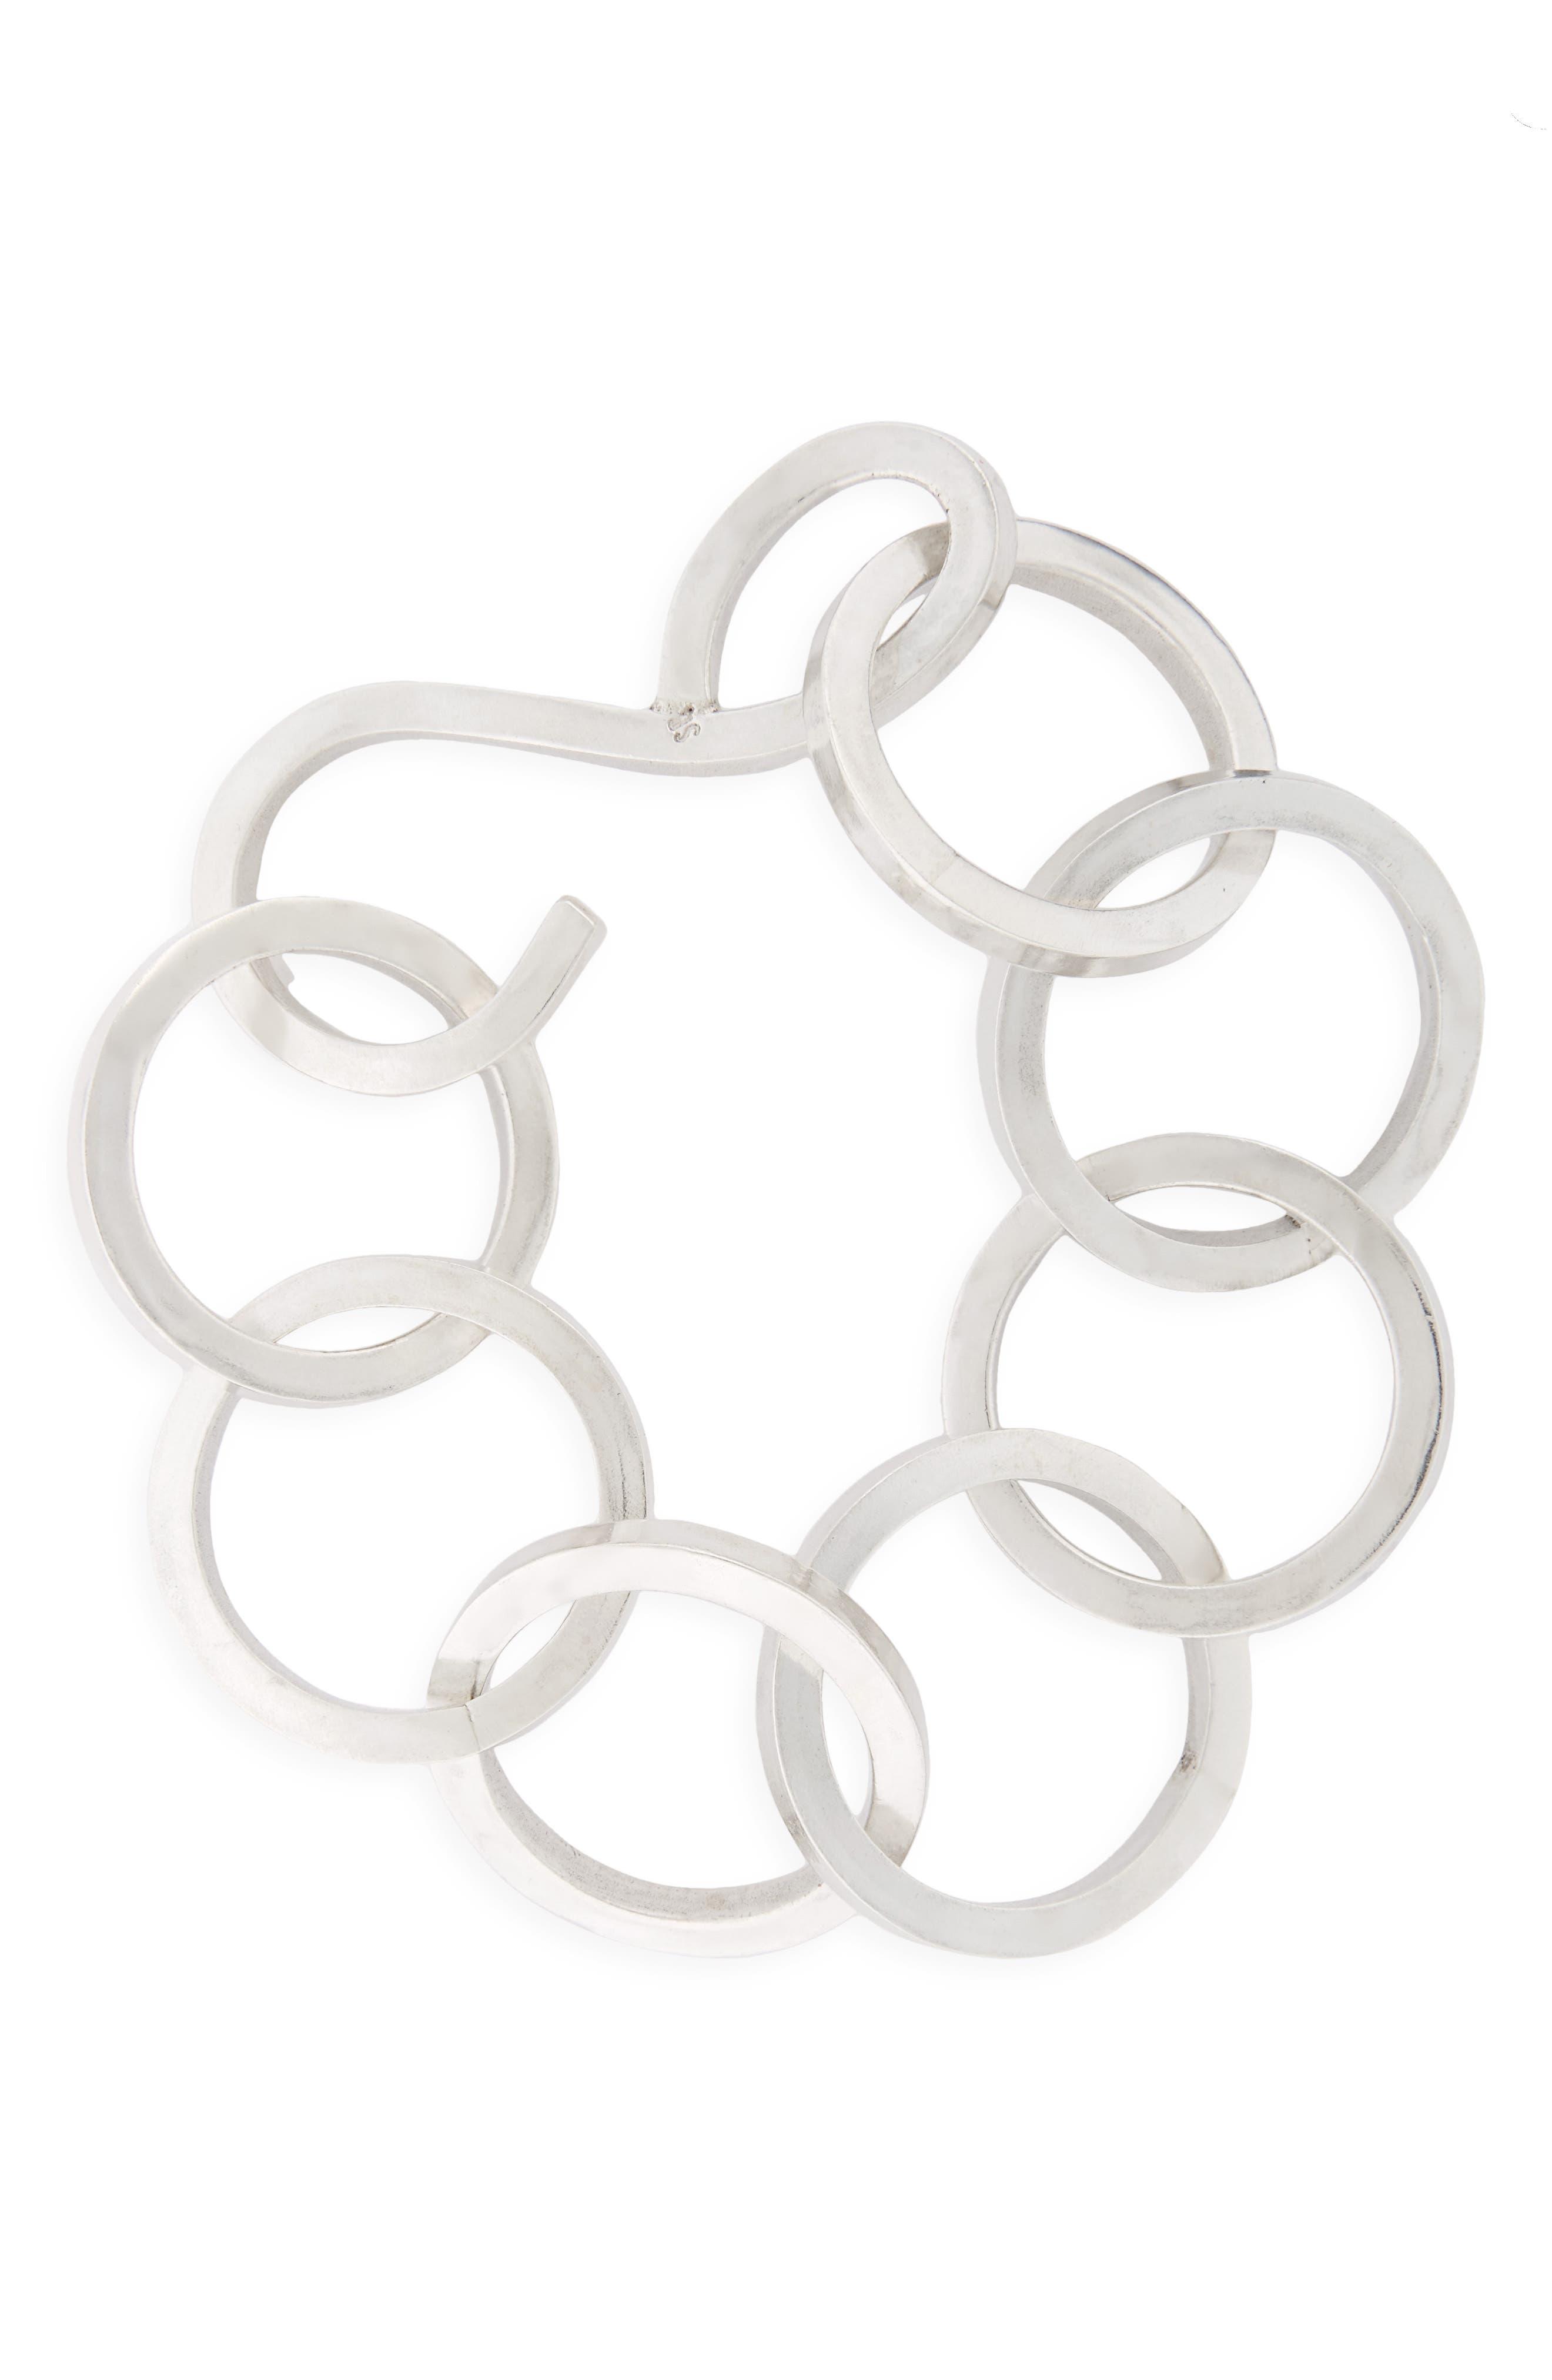 Margaritte Bracelet,                         Main,                         color, Sterling Silver